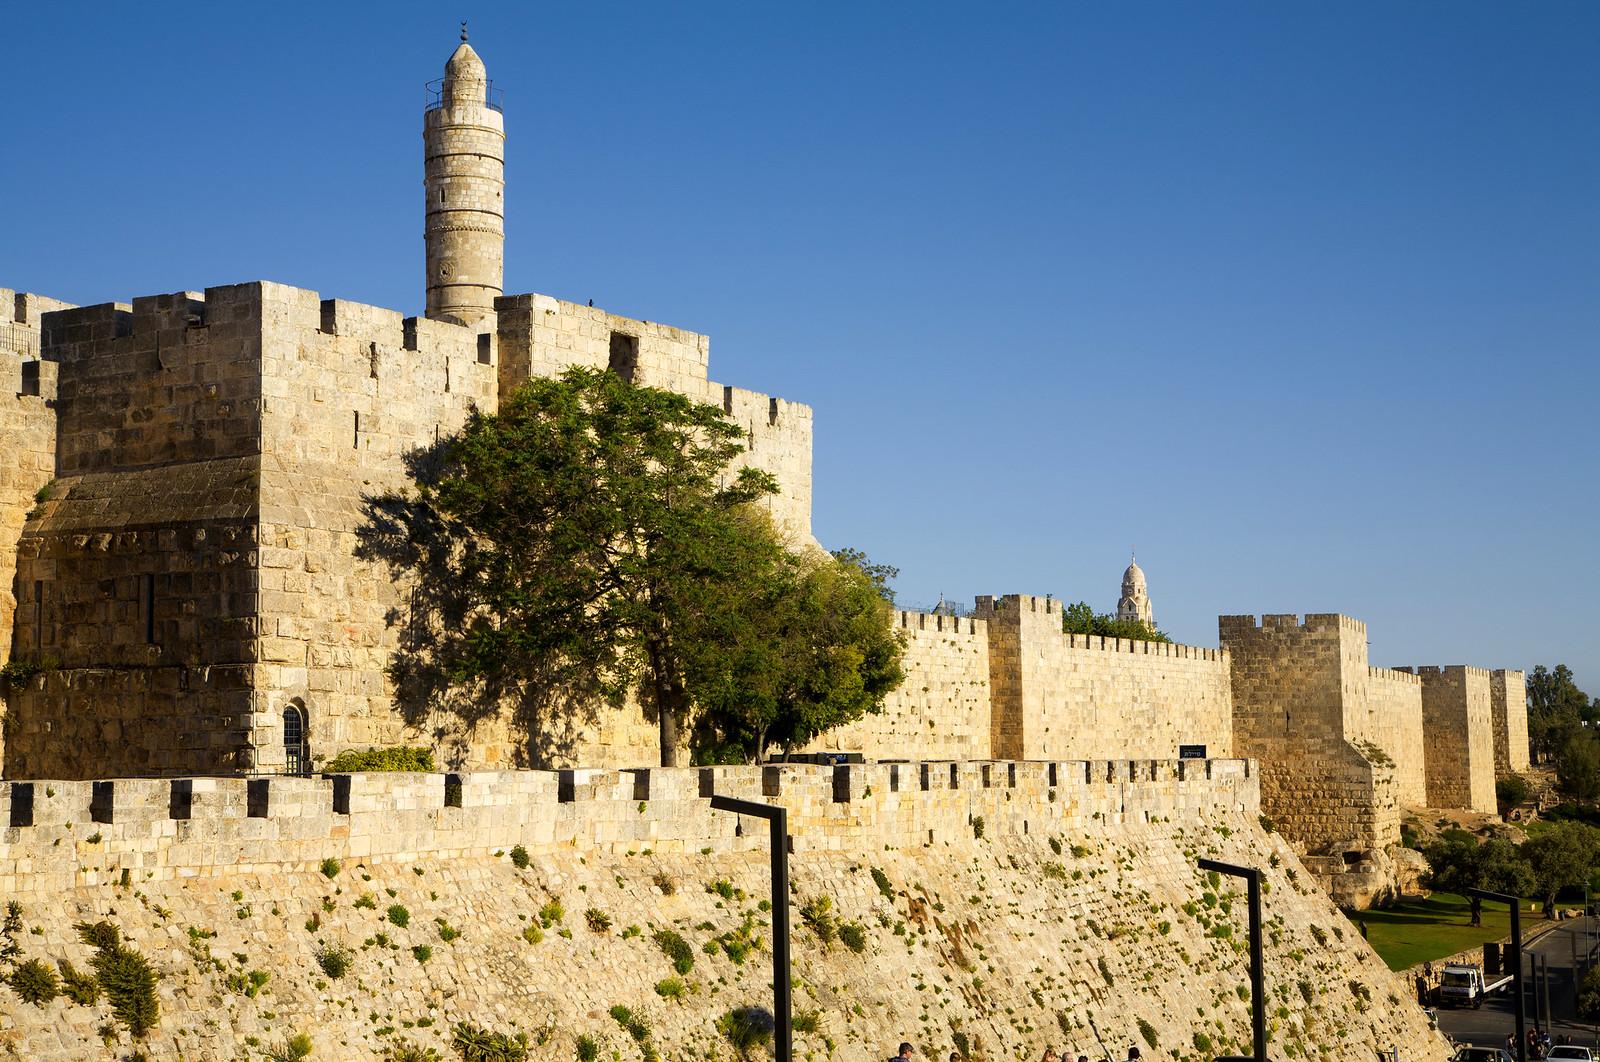 Jerusalem_The Tower of David_4_Noam Chen_IMOT